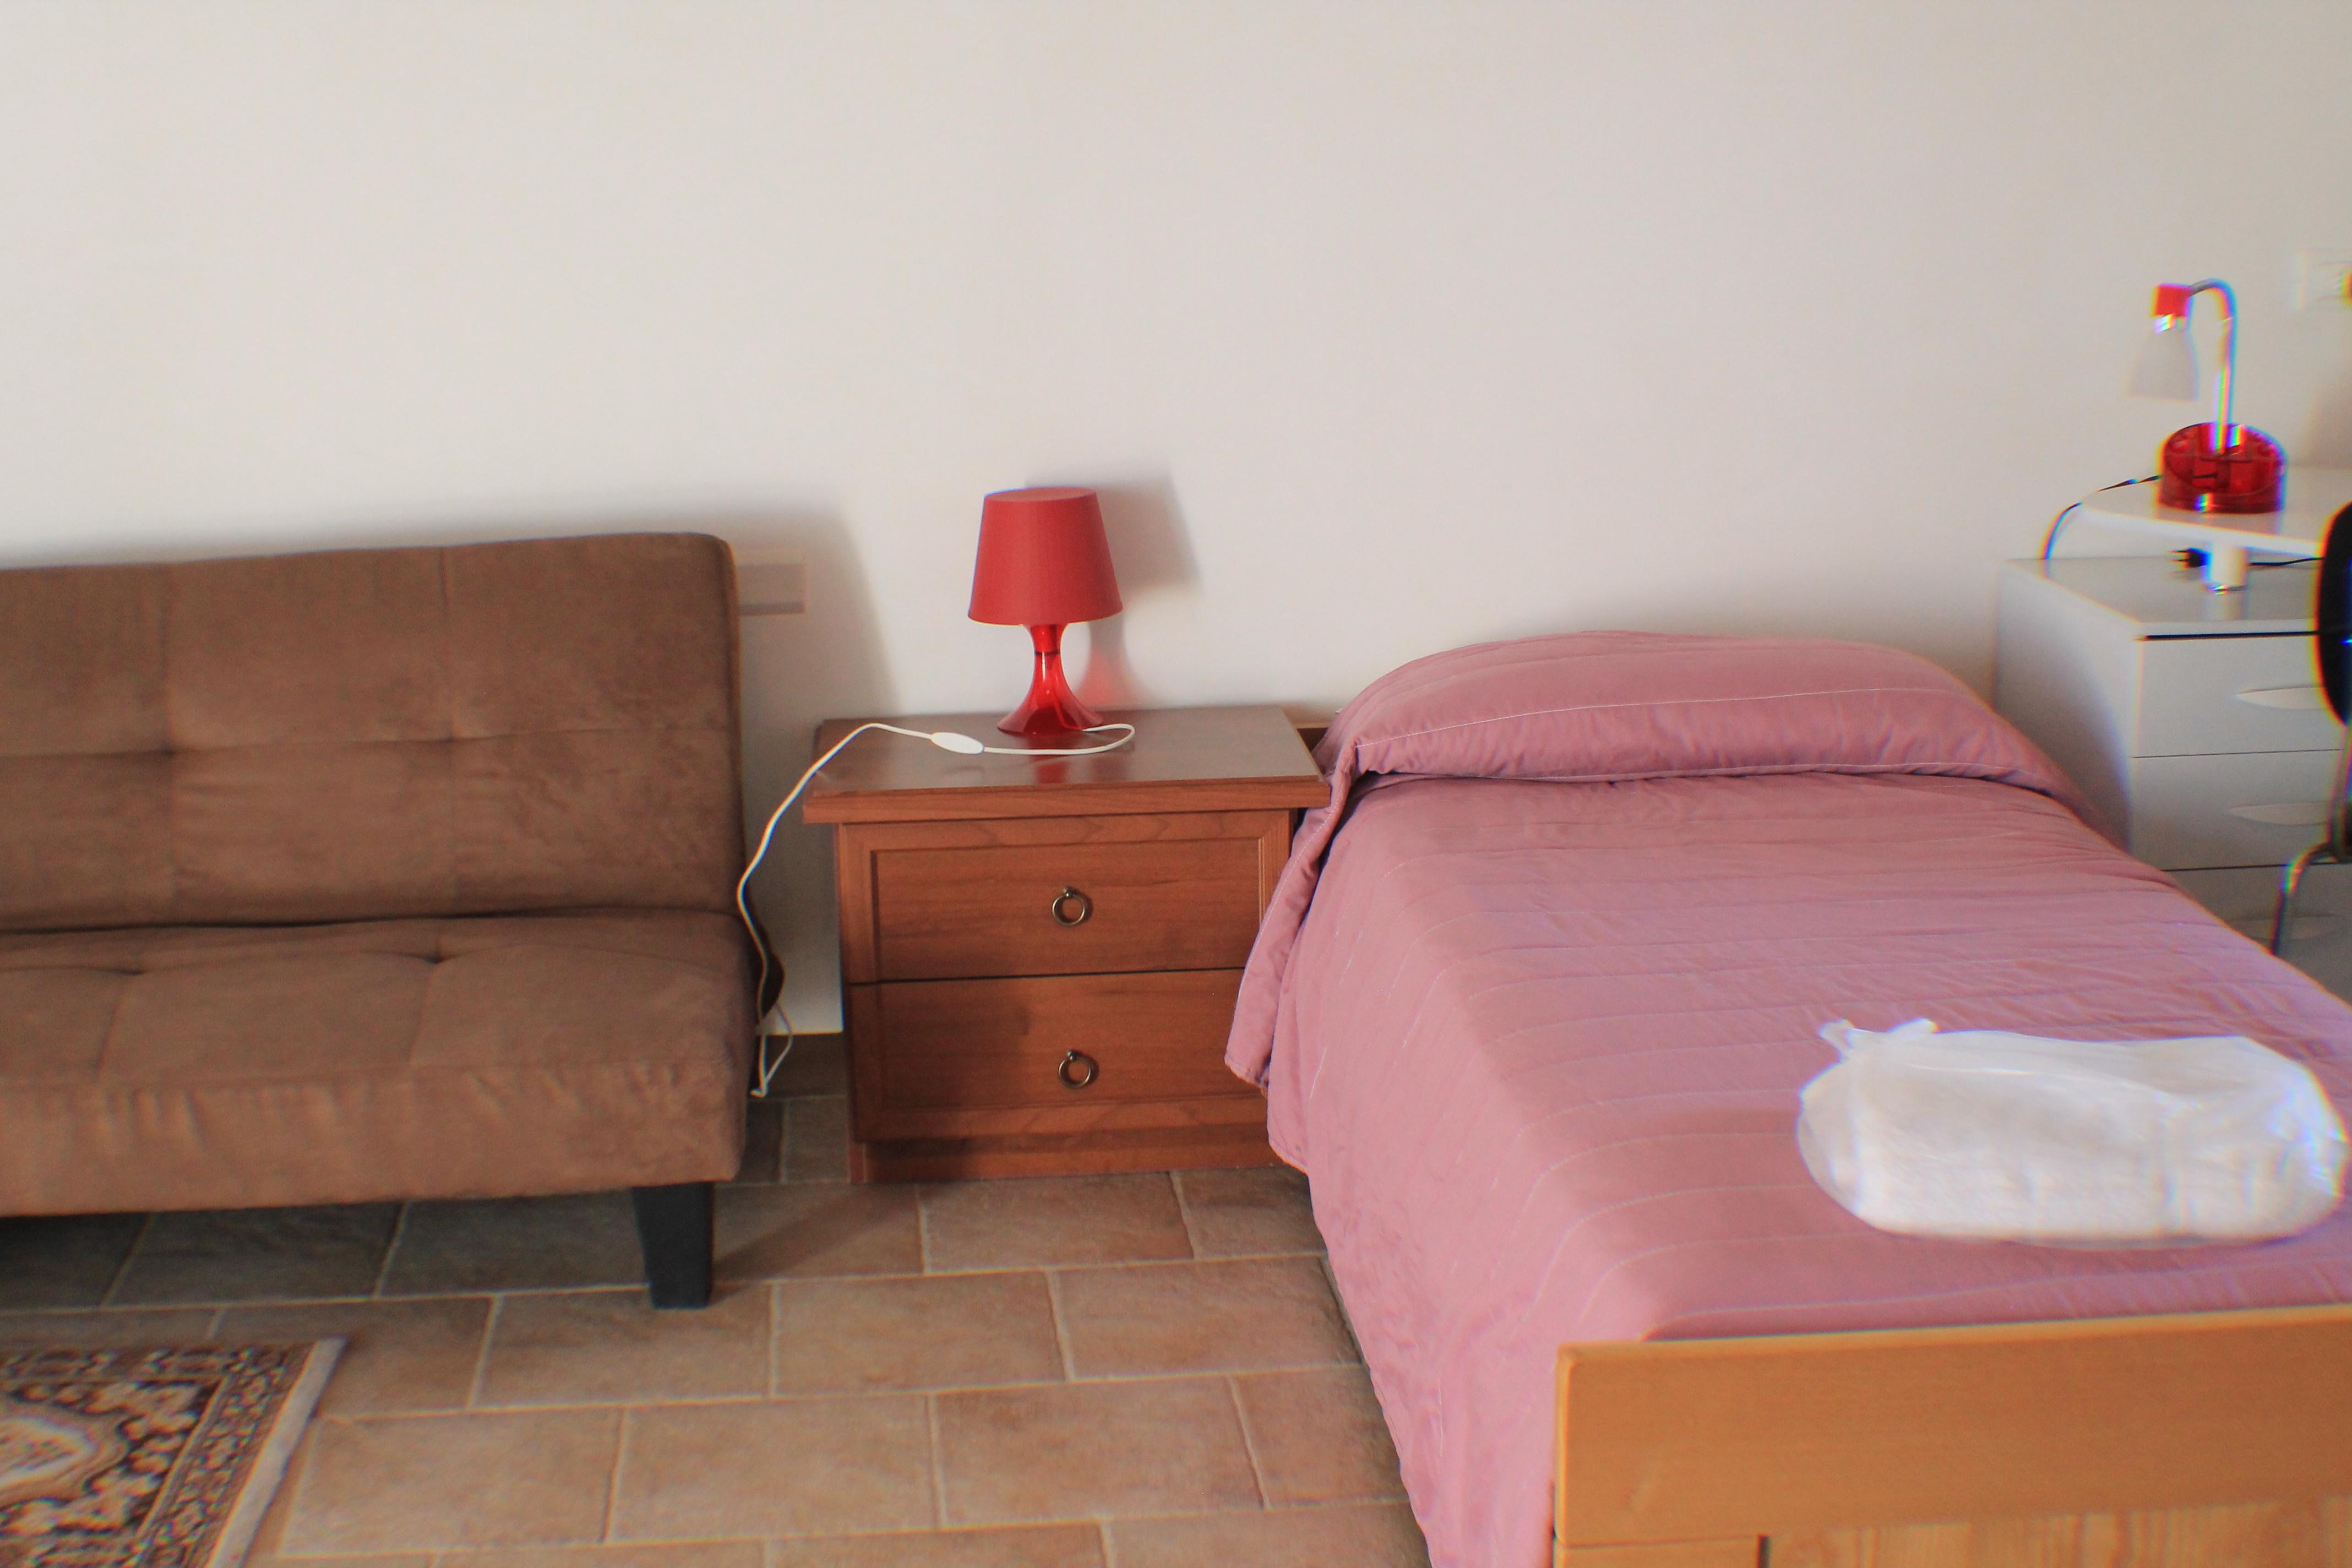 Appartement de vacances Agriturismo Le Due Palme - Das Paradies Von Adamo (2506981), Modica, Ragusa, Sicile, Italie, image 18